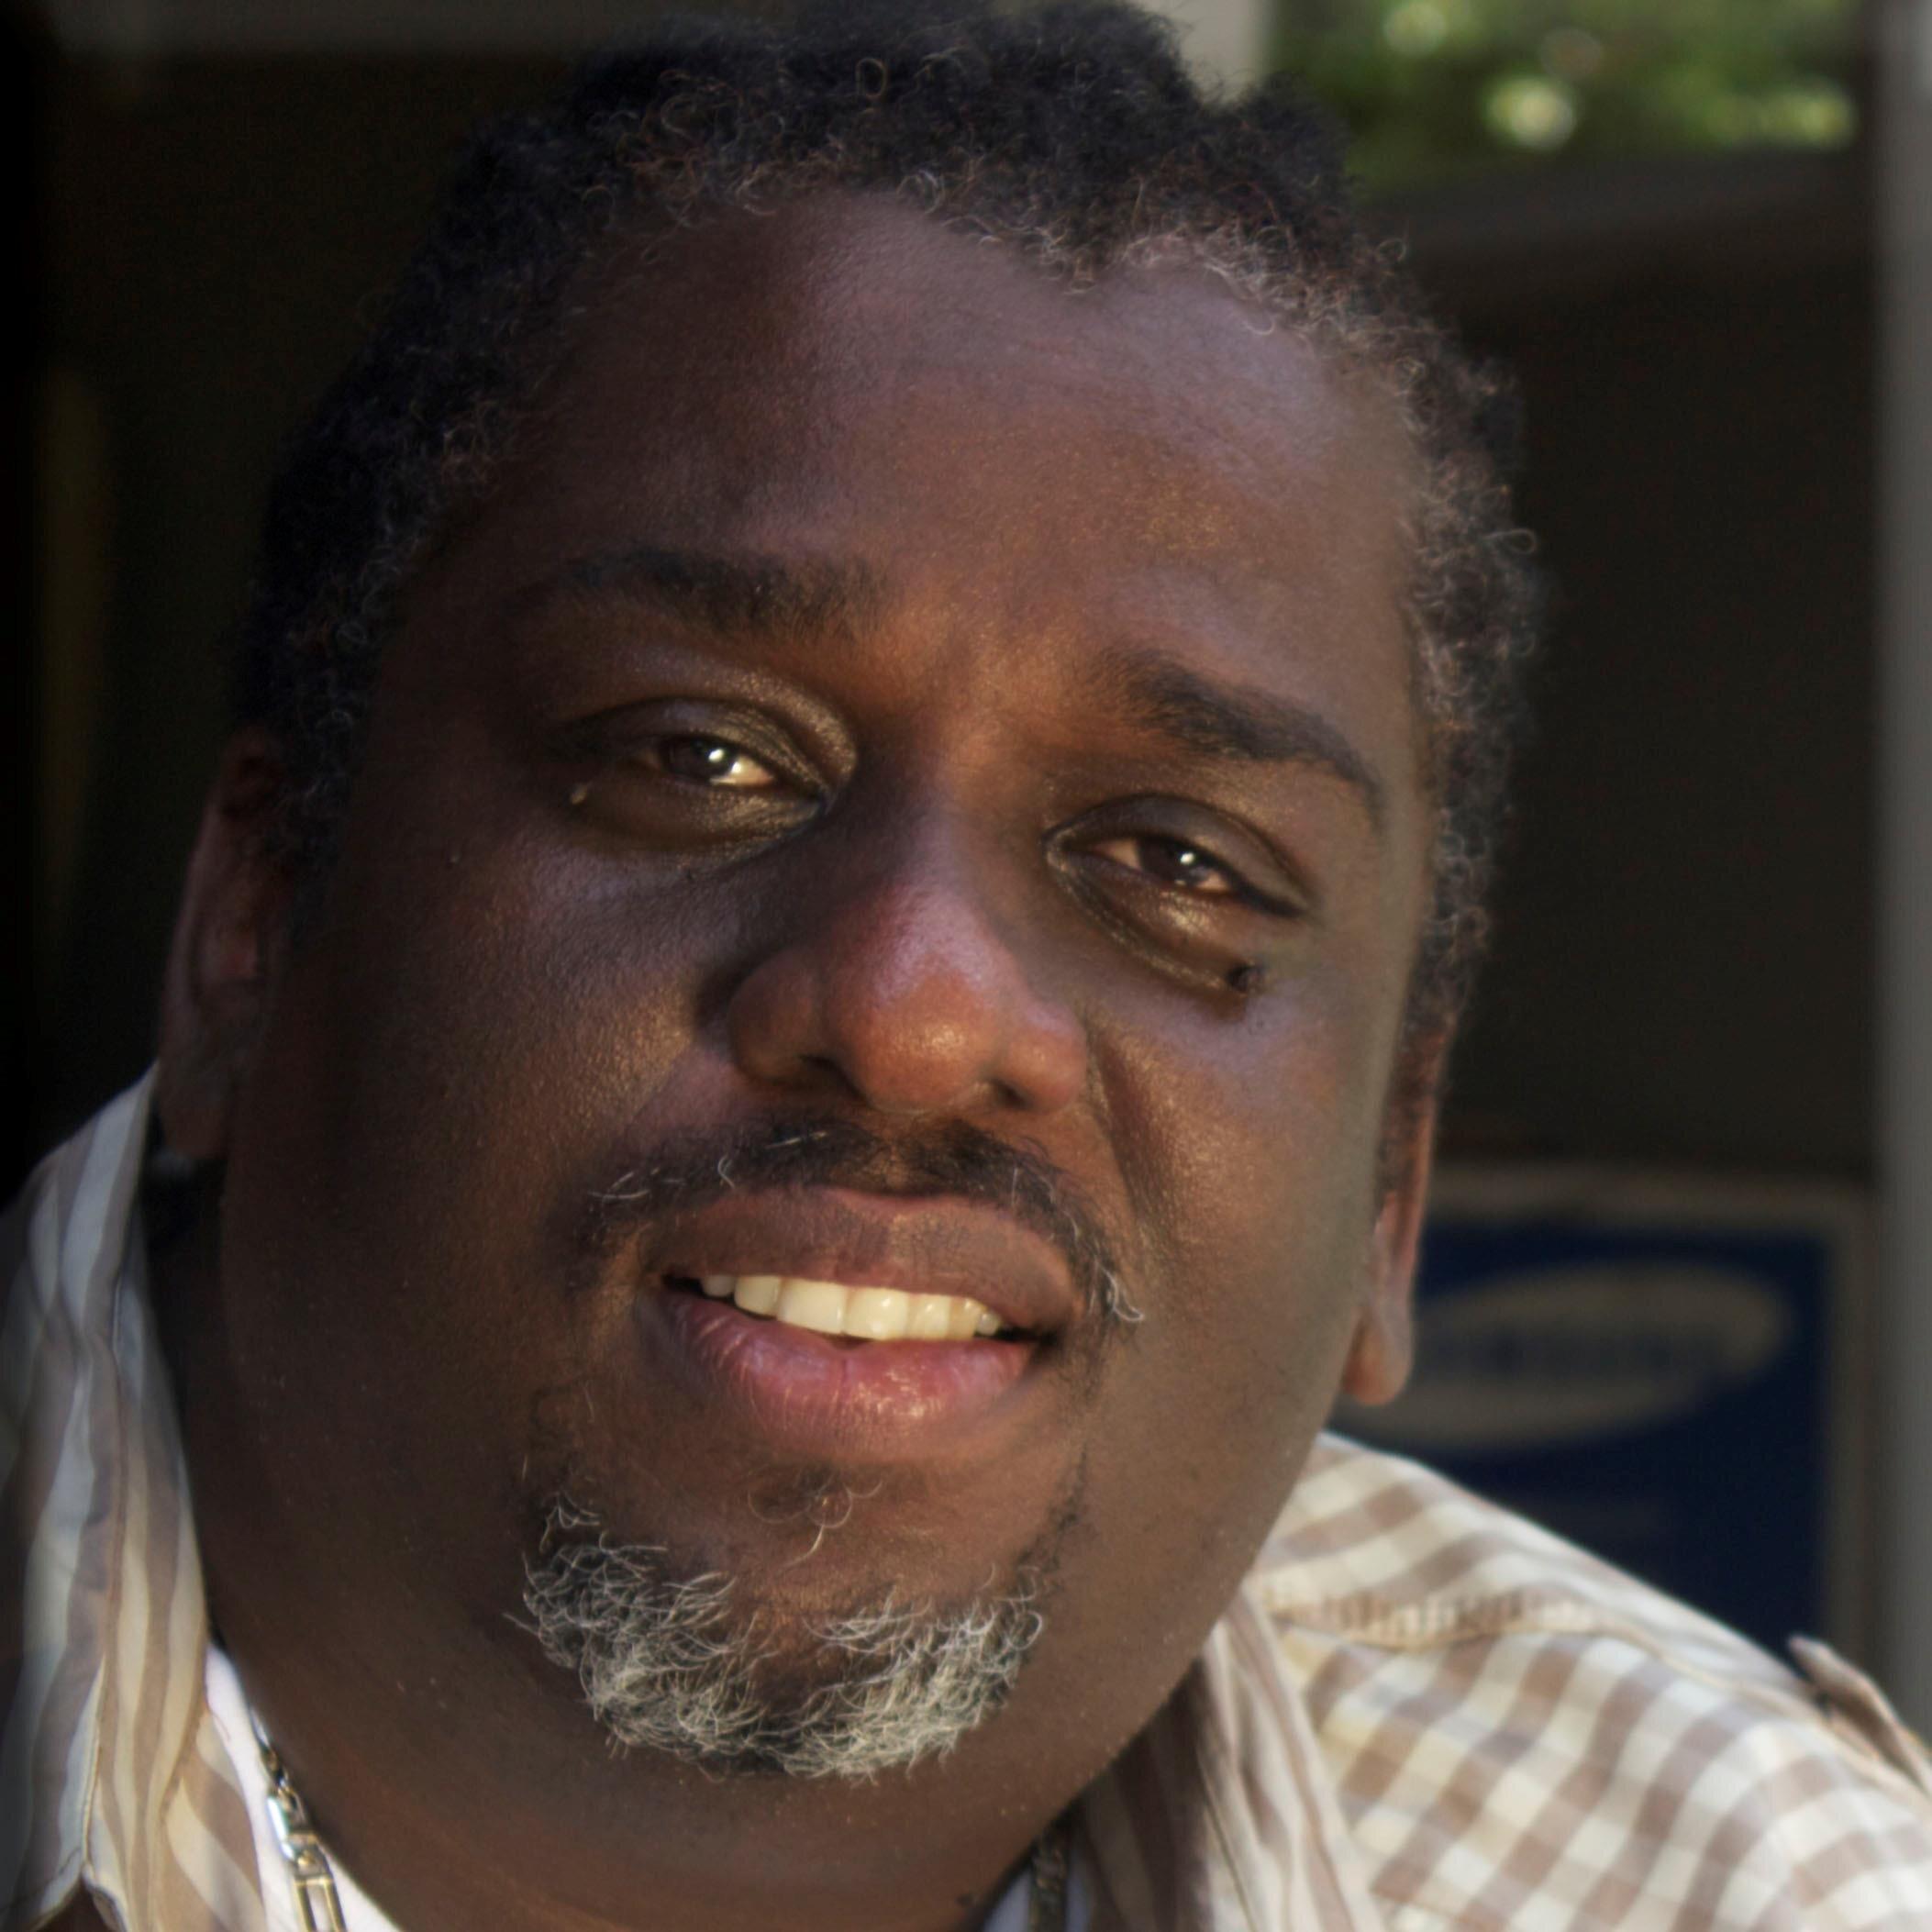 Affaire Youri Chevry : L'Etat haïtien exige son extradition